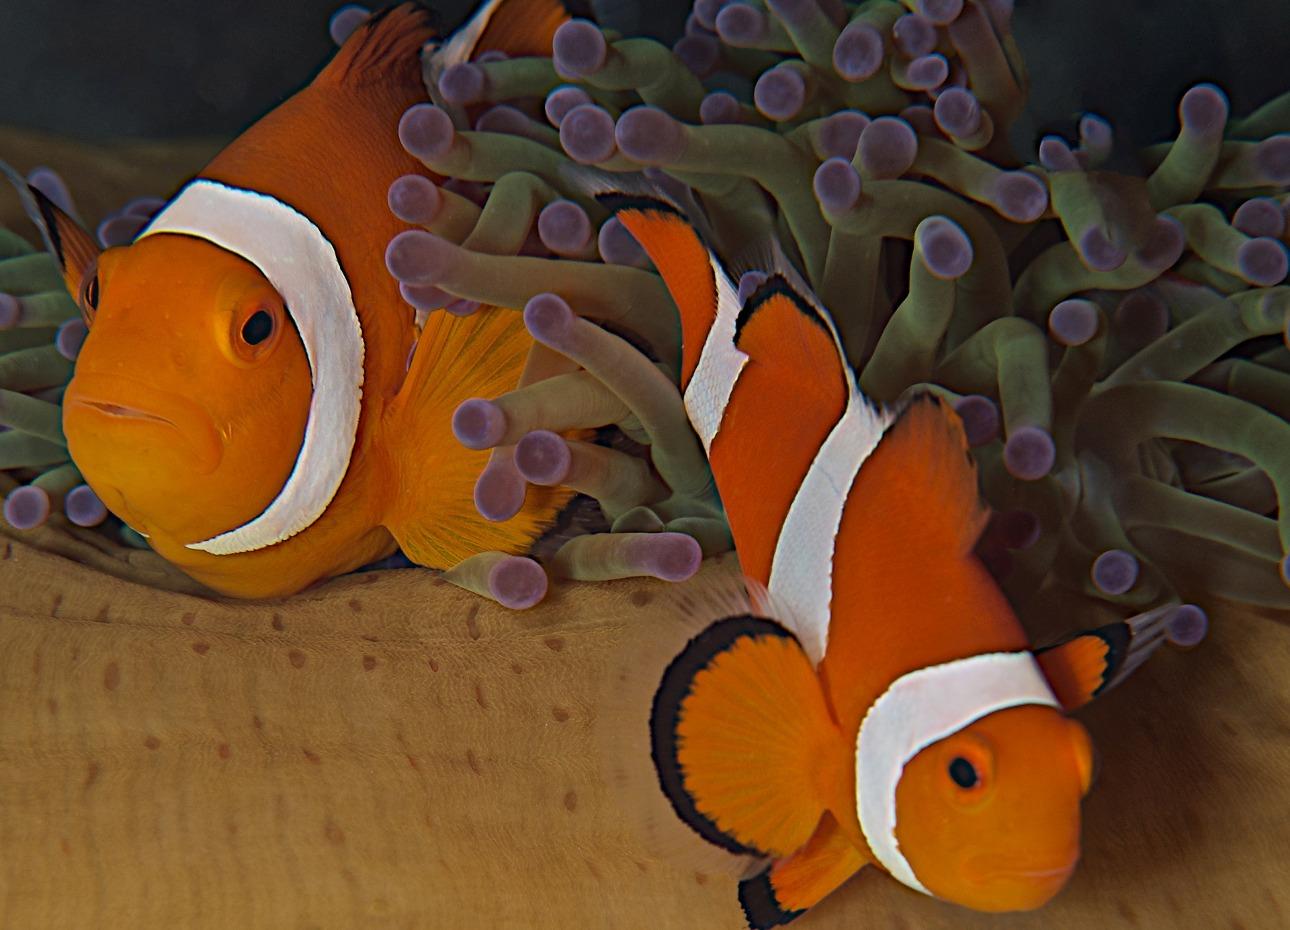 Philippines, Moalboal Magic Island, Dive Resort, Clownfish, image,